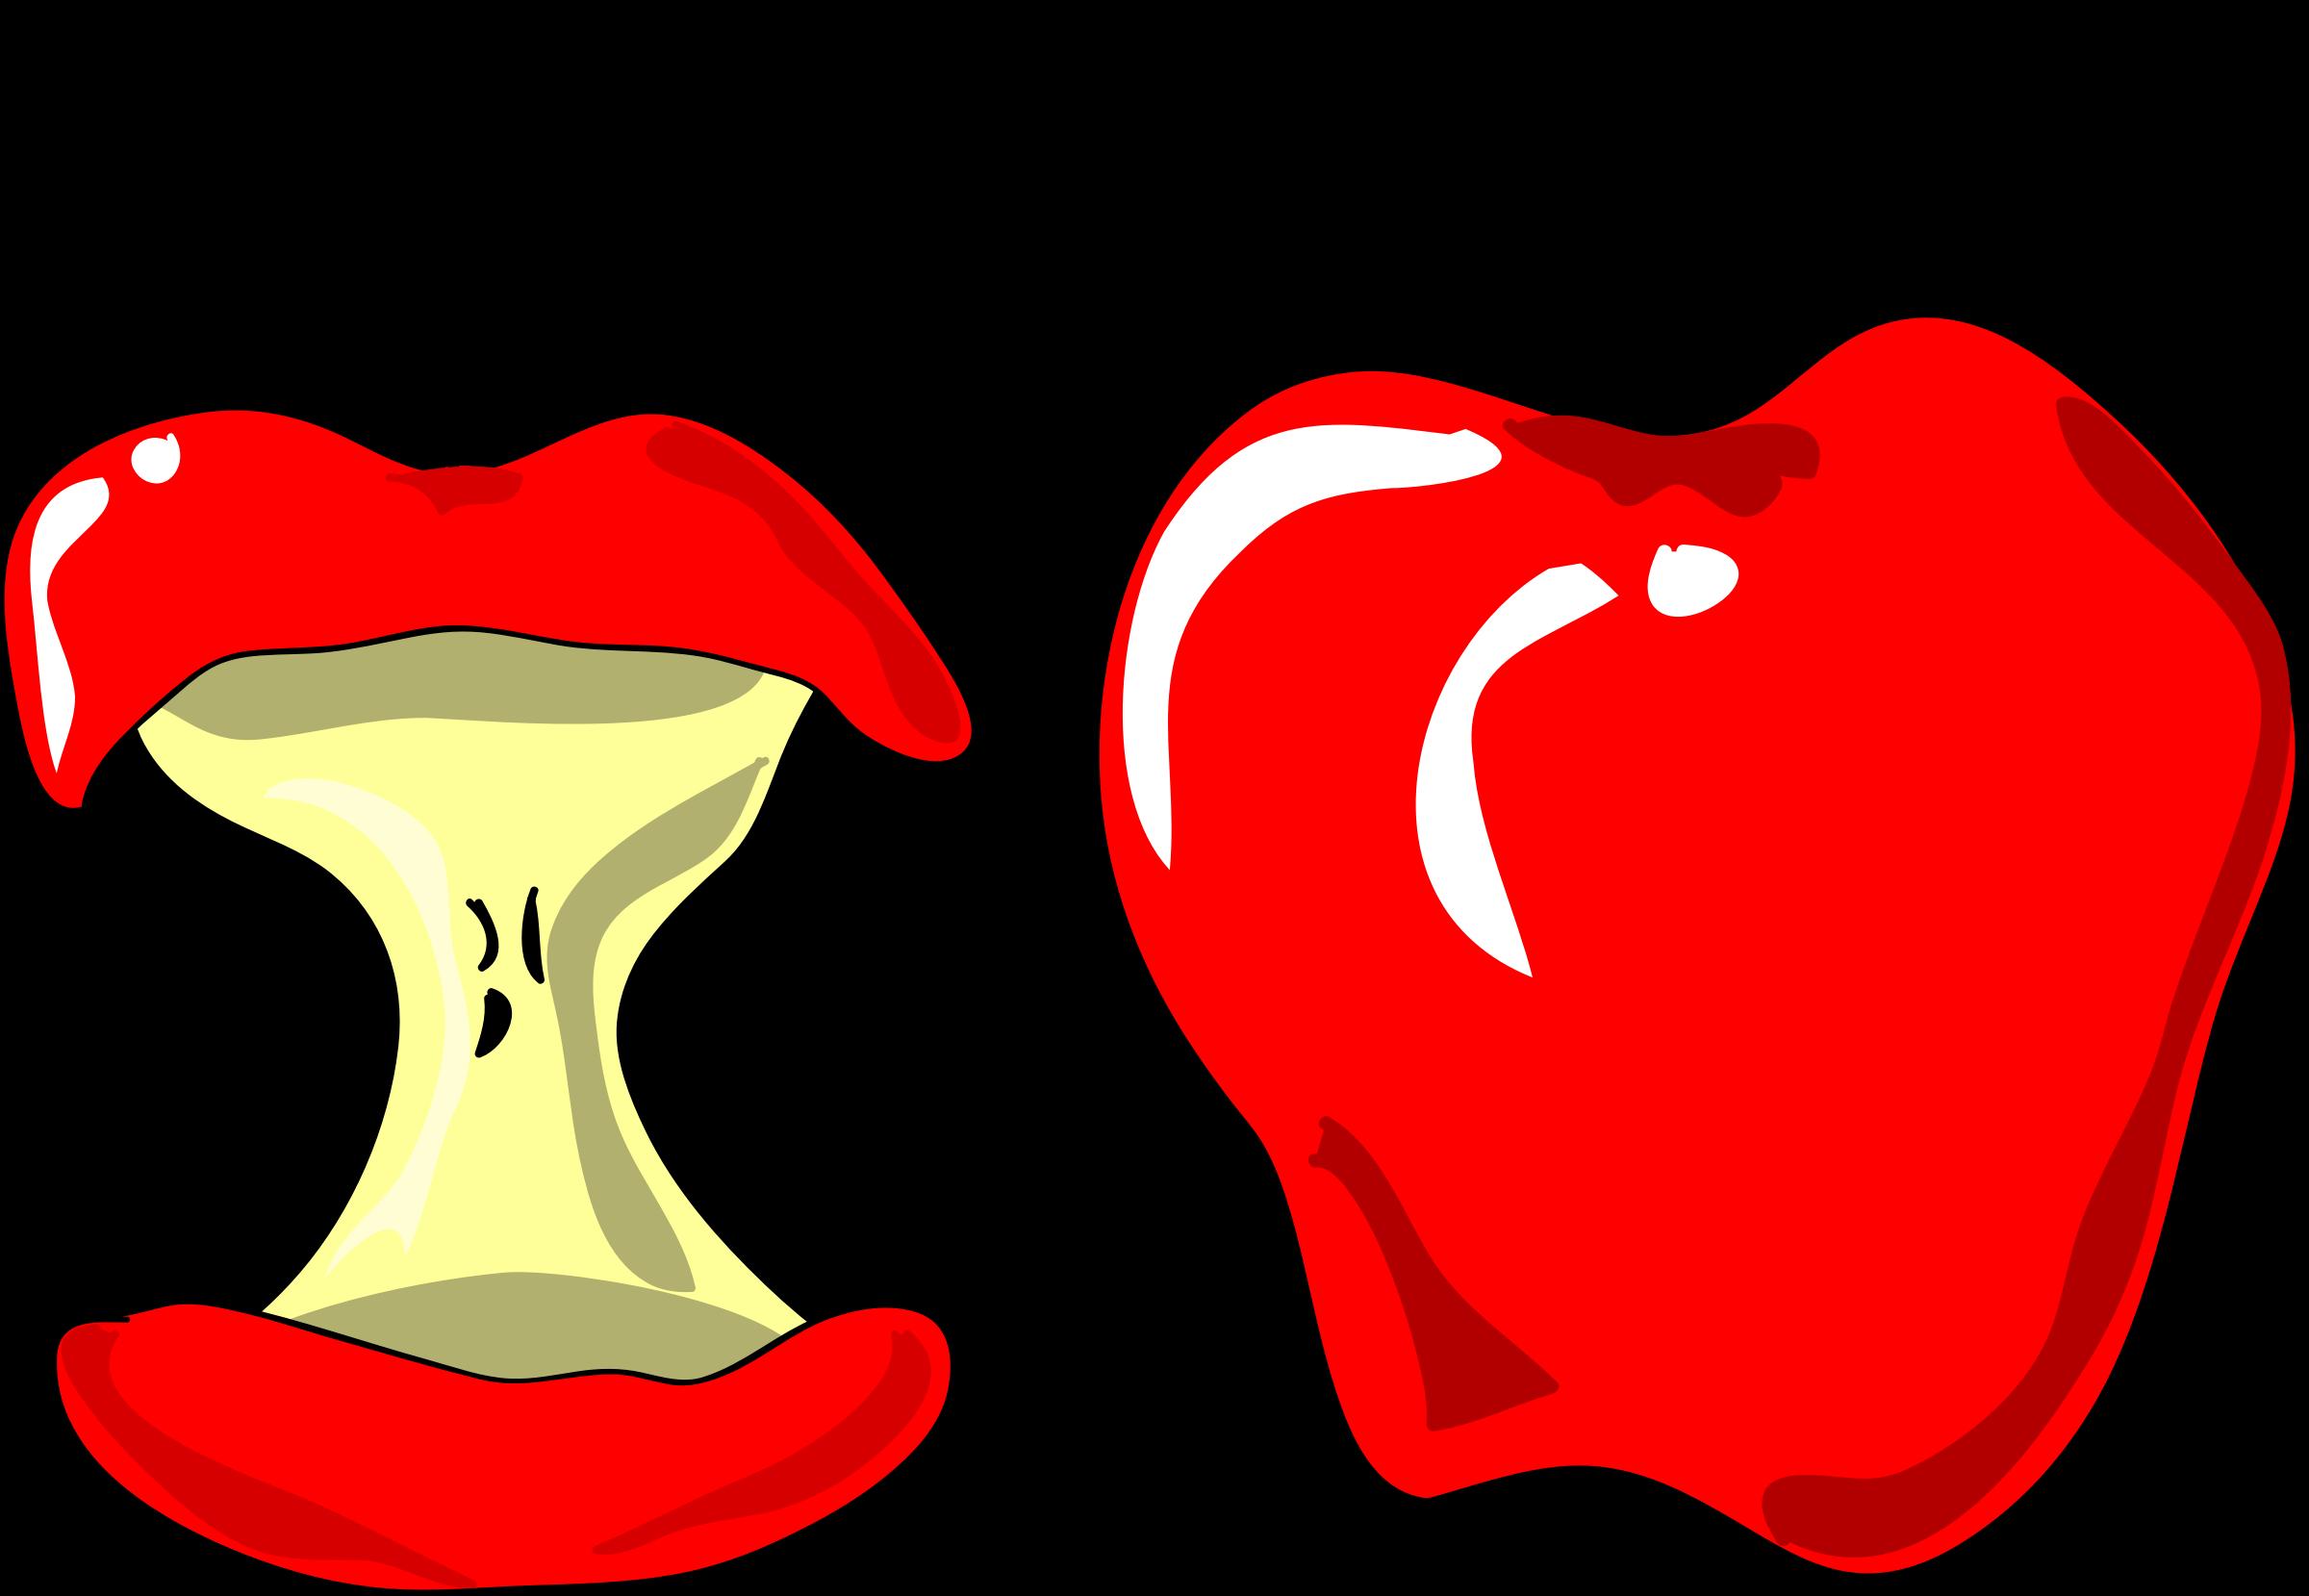 Clipart apple cartoon. Apples big image png